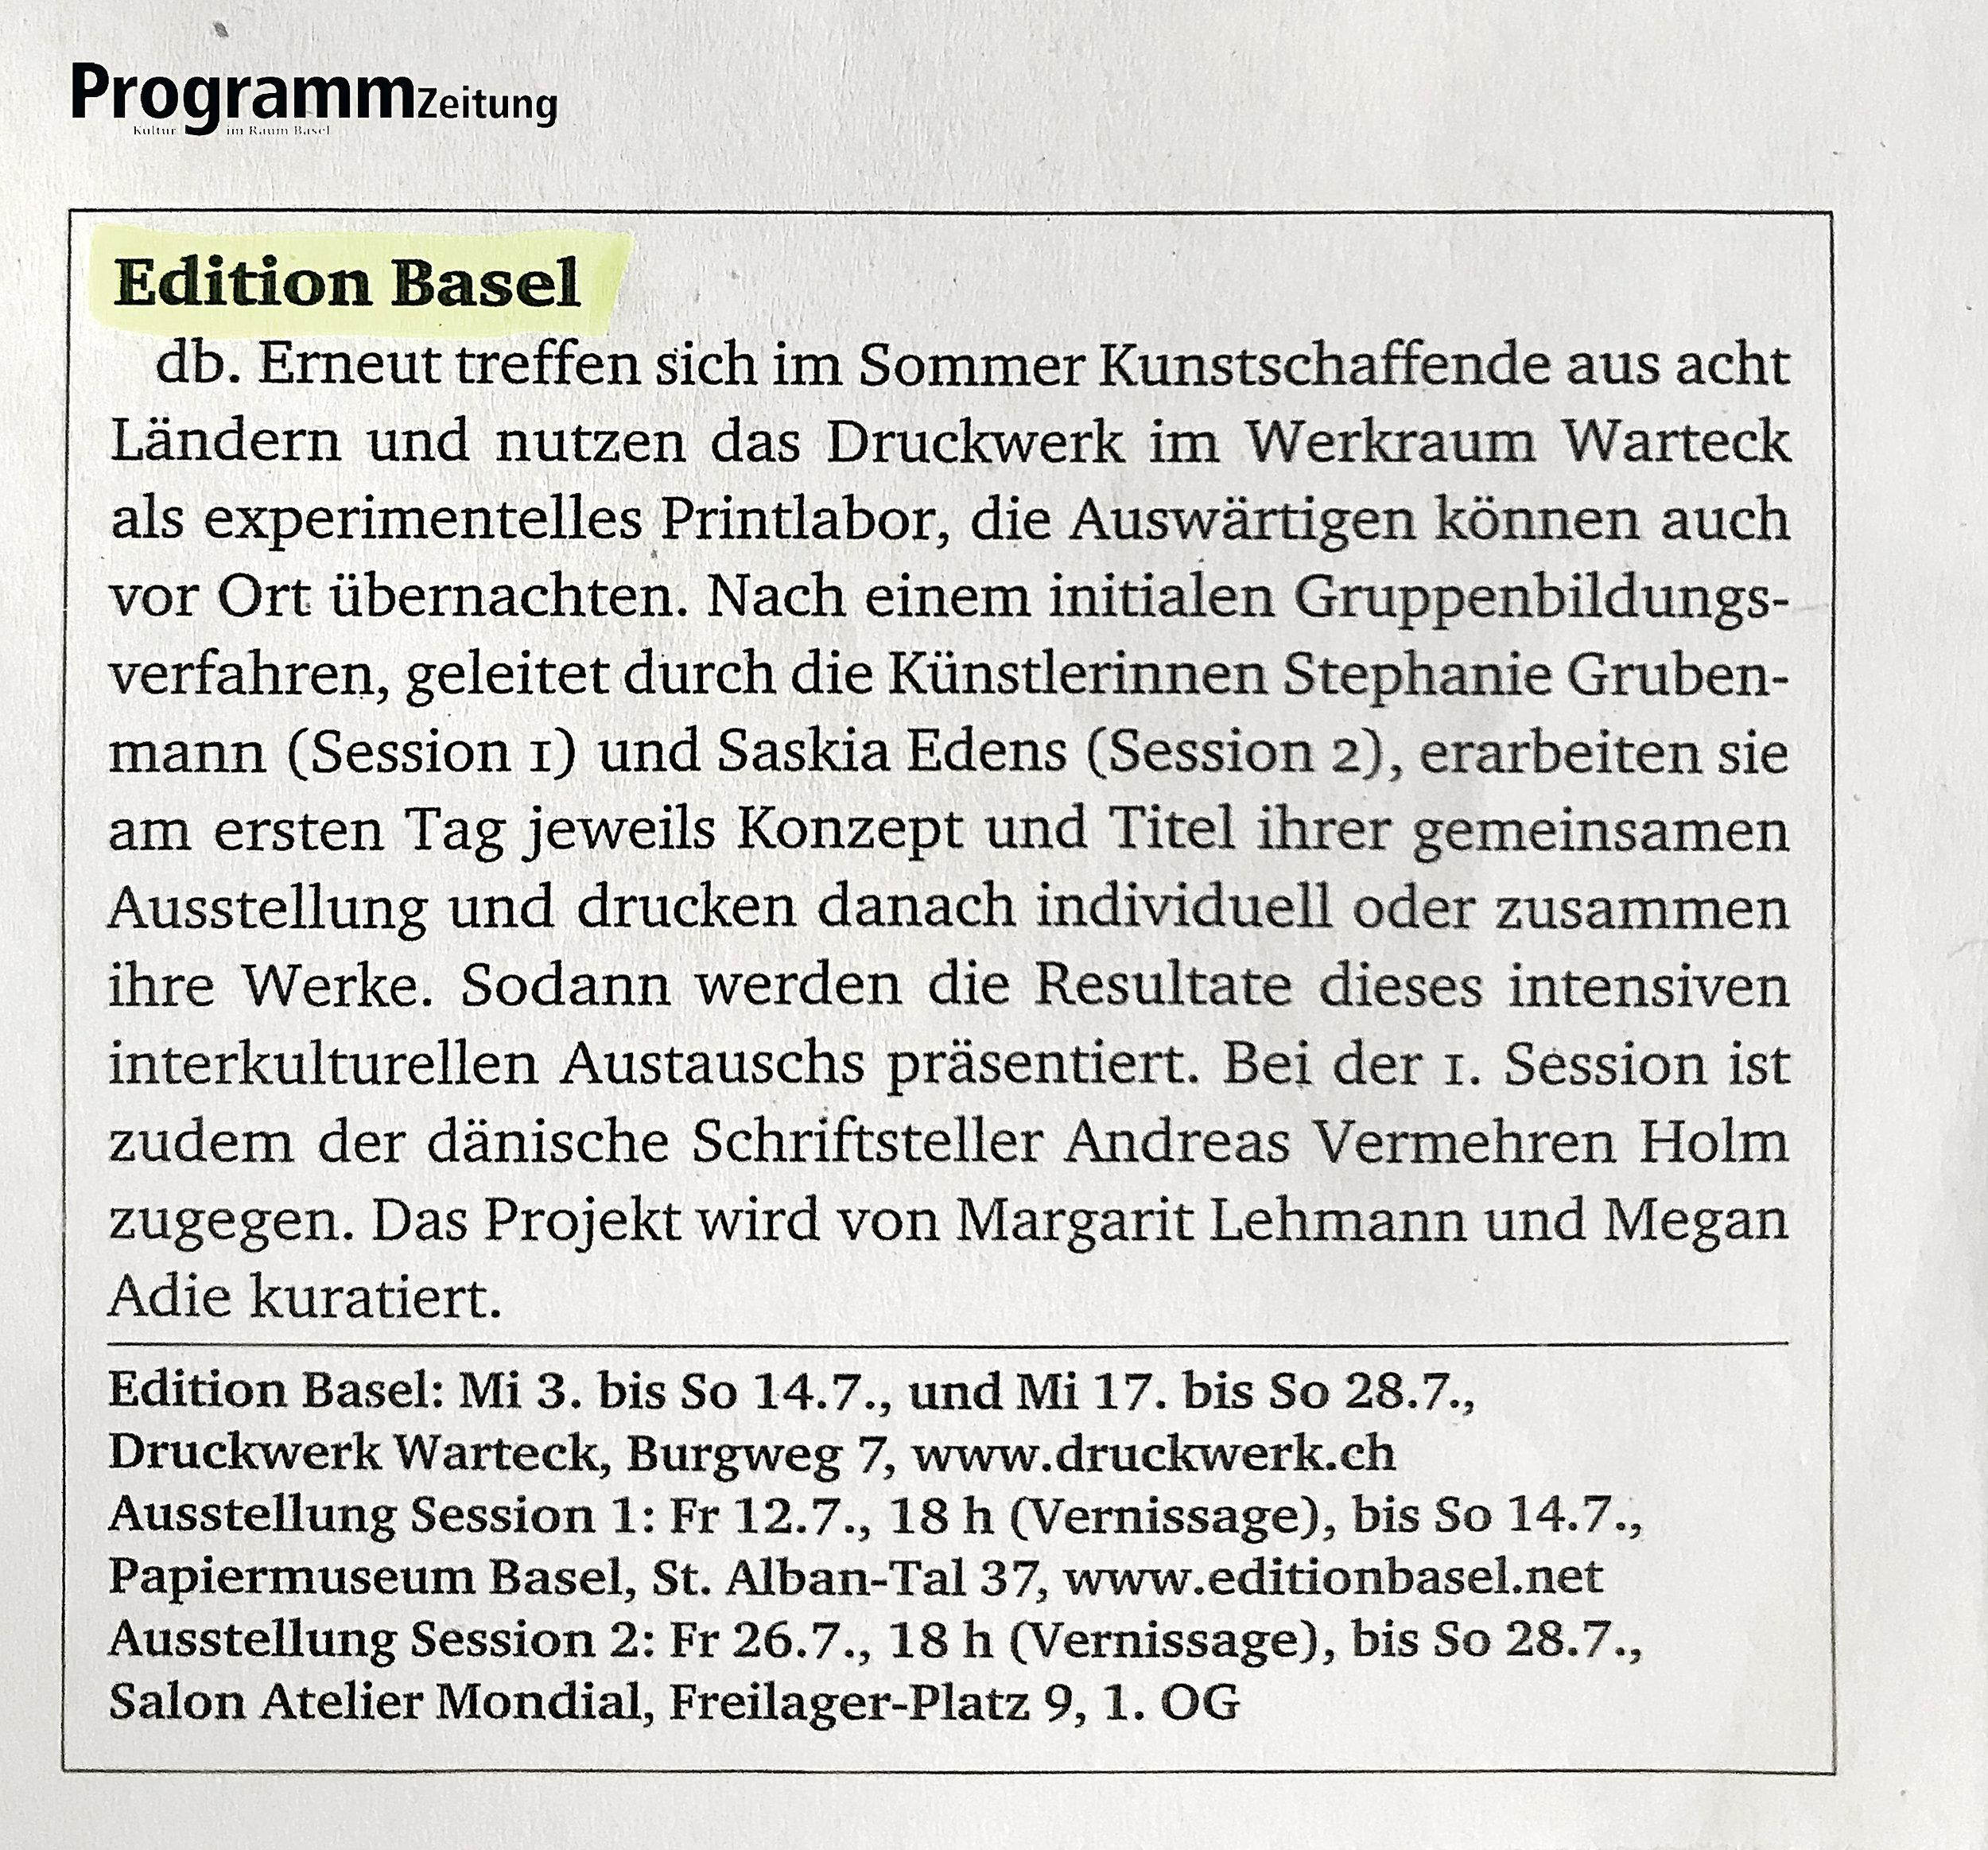 ProgrammZeitung 2019_ DB.jpg